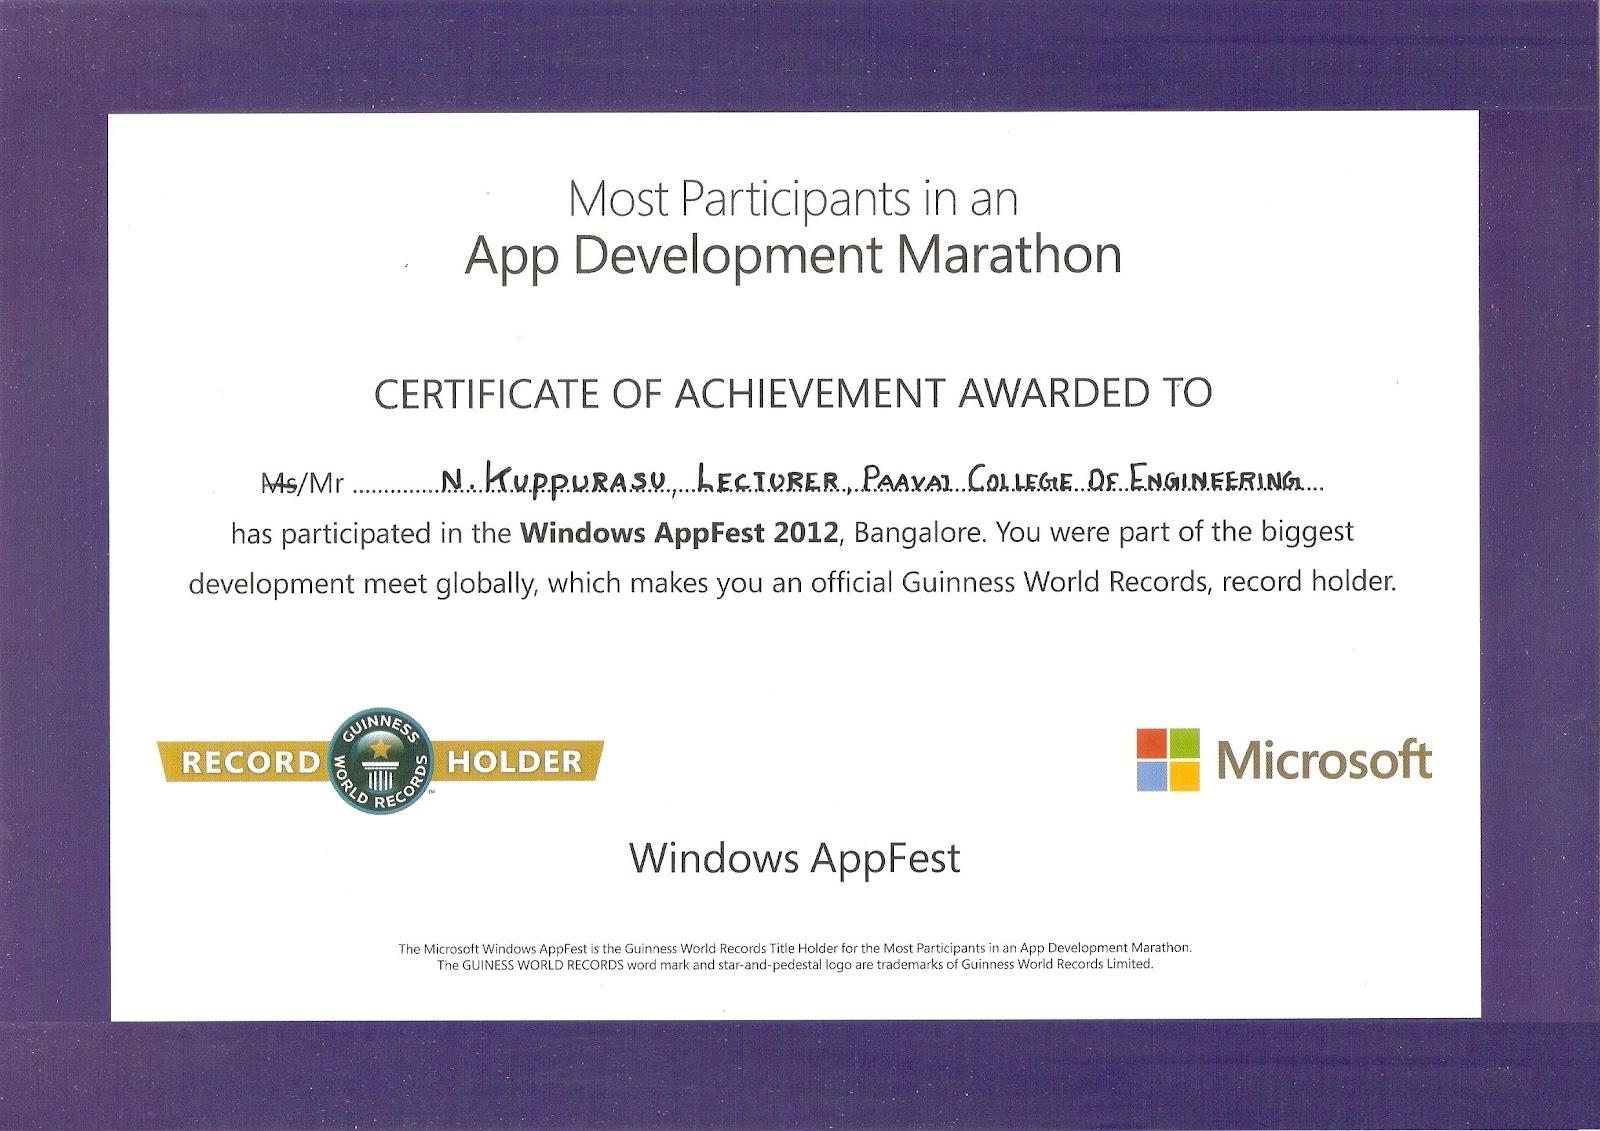 Kuppurasu window apps fest guinness world record certificate window apps fest guinness world record certificate 1betcityfo Choice Image